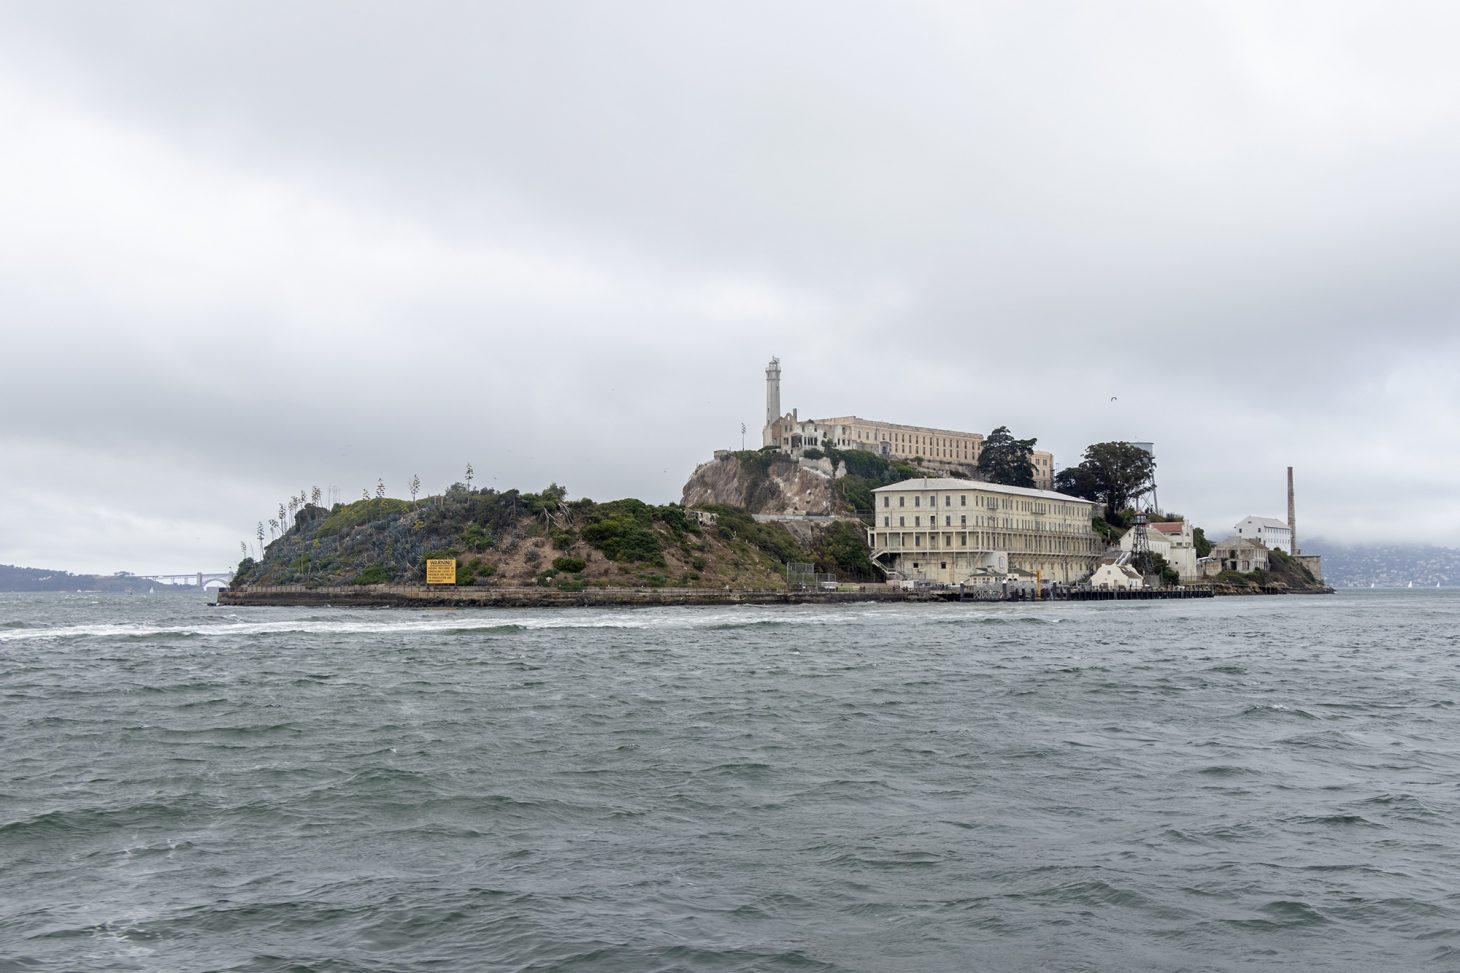 Alcatraz Prison on Alcatraz island